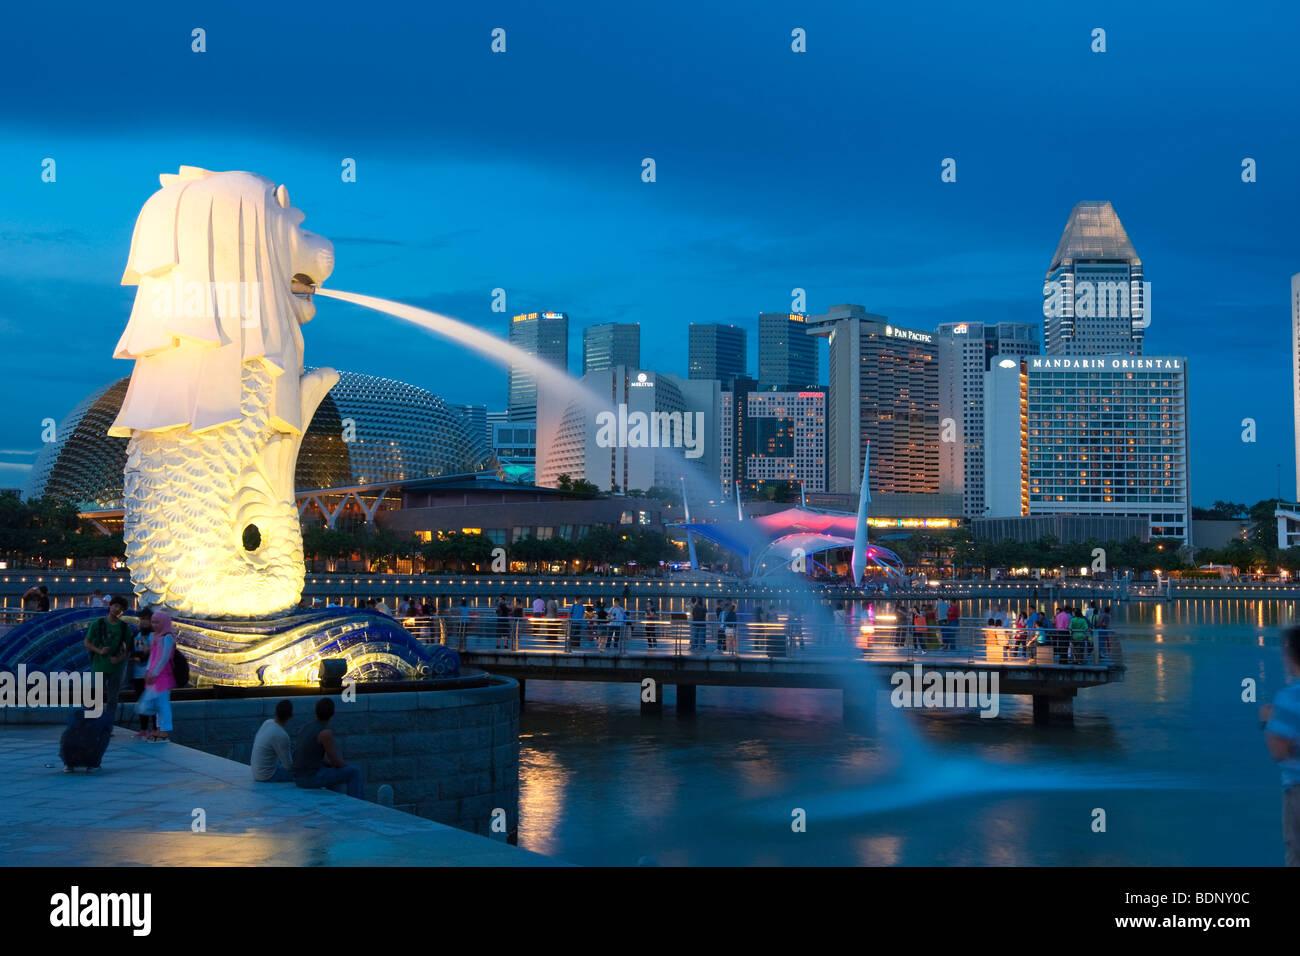 The Merlion, landmark of the metropolis of Singapore, designed by artist Fraser Brunner in 1964, Singapore River, Singapore, So Stock Photo